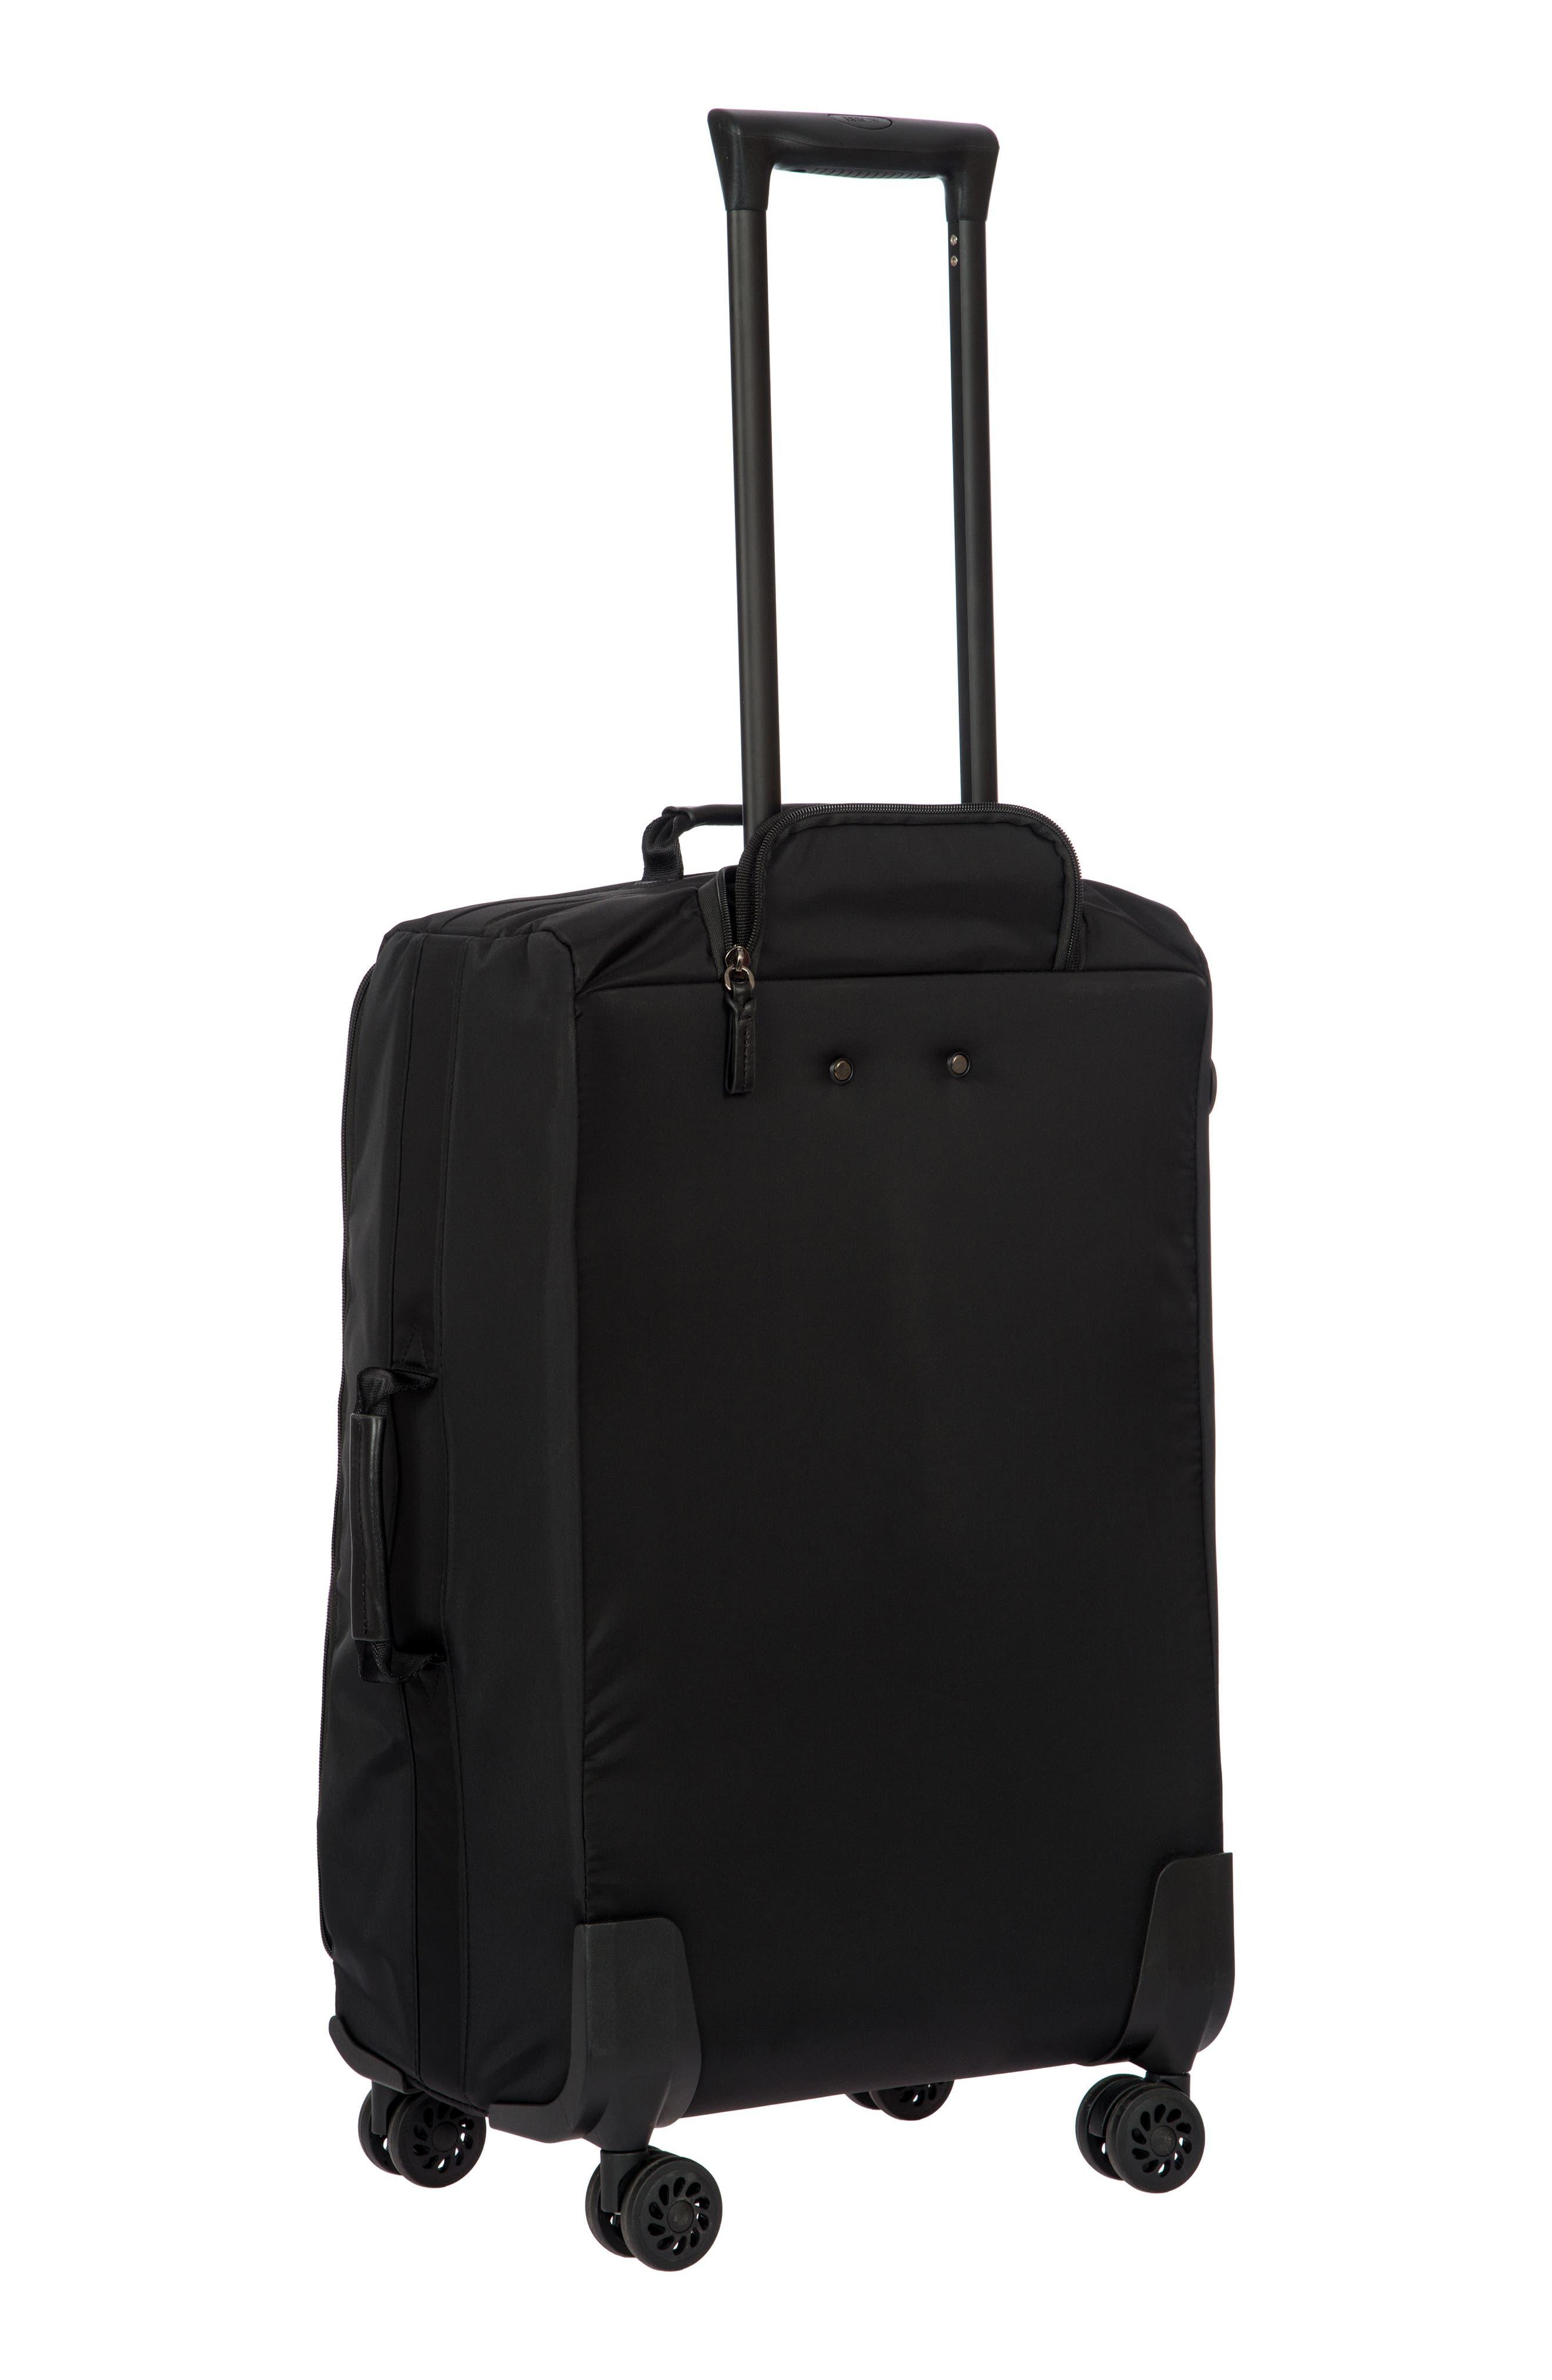 X-Bag 25-Inch Spinner Suitcase,                             Alternate thumbnail 4, color,                             BLACK/ BLACK